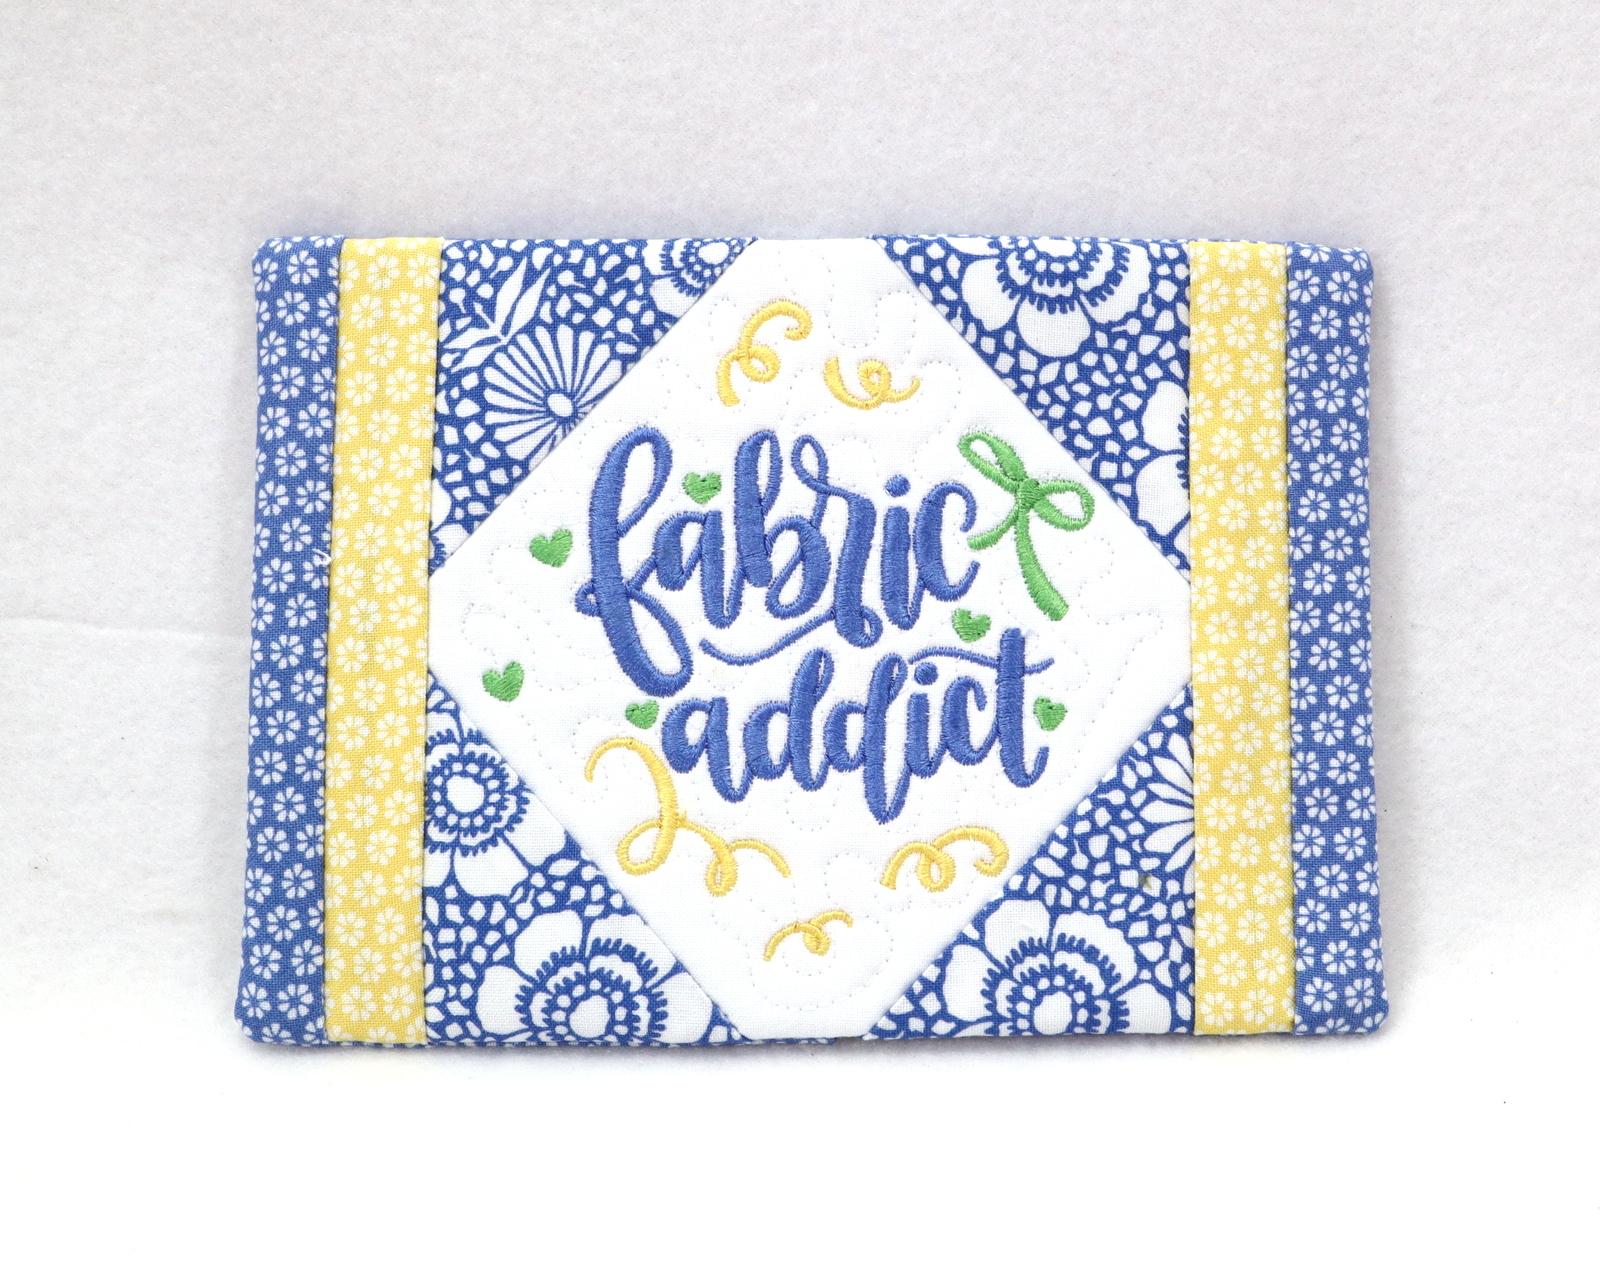 Fabric Addict Mug Rug-3